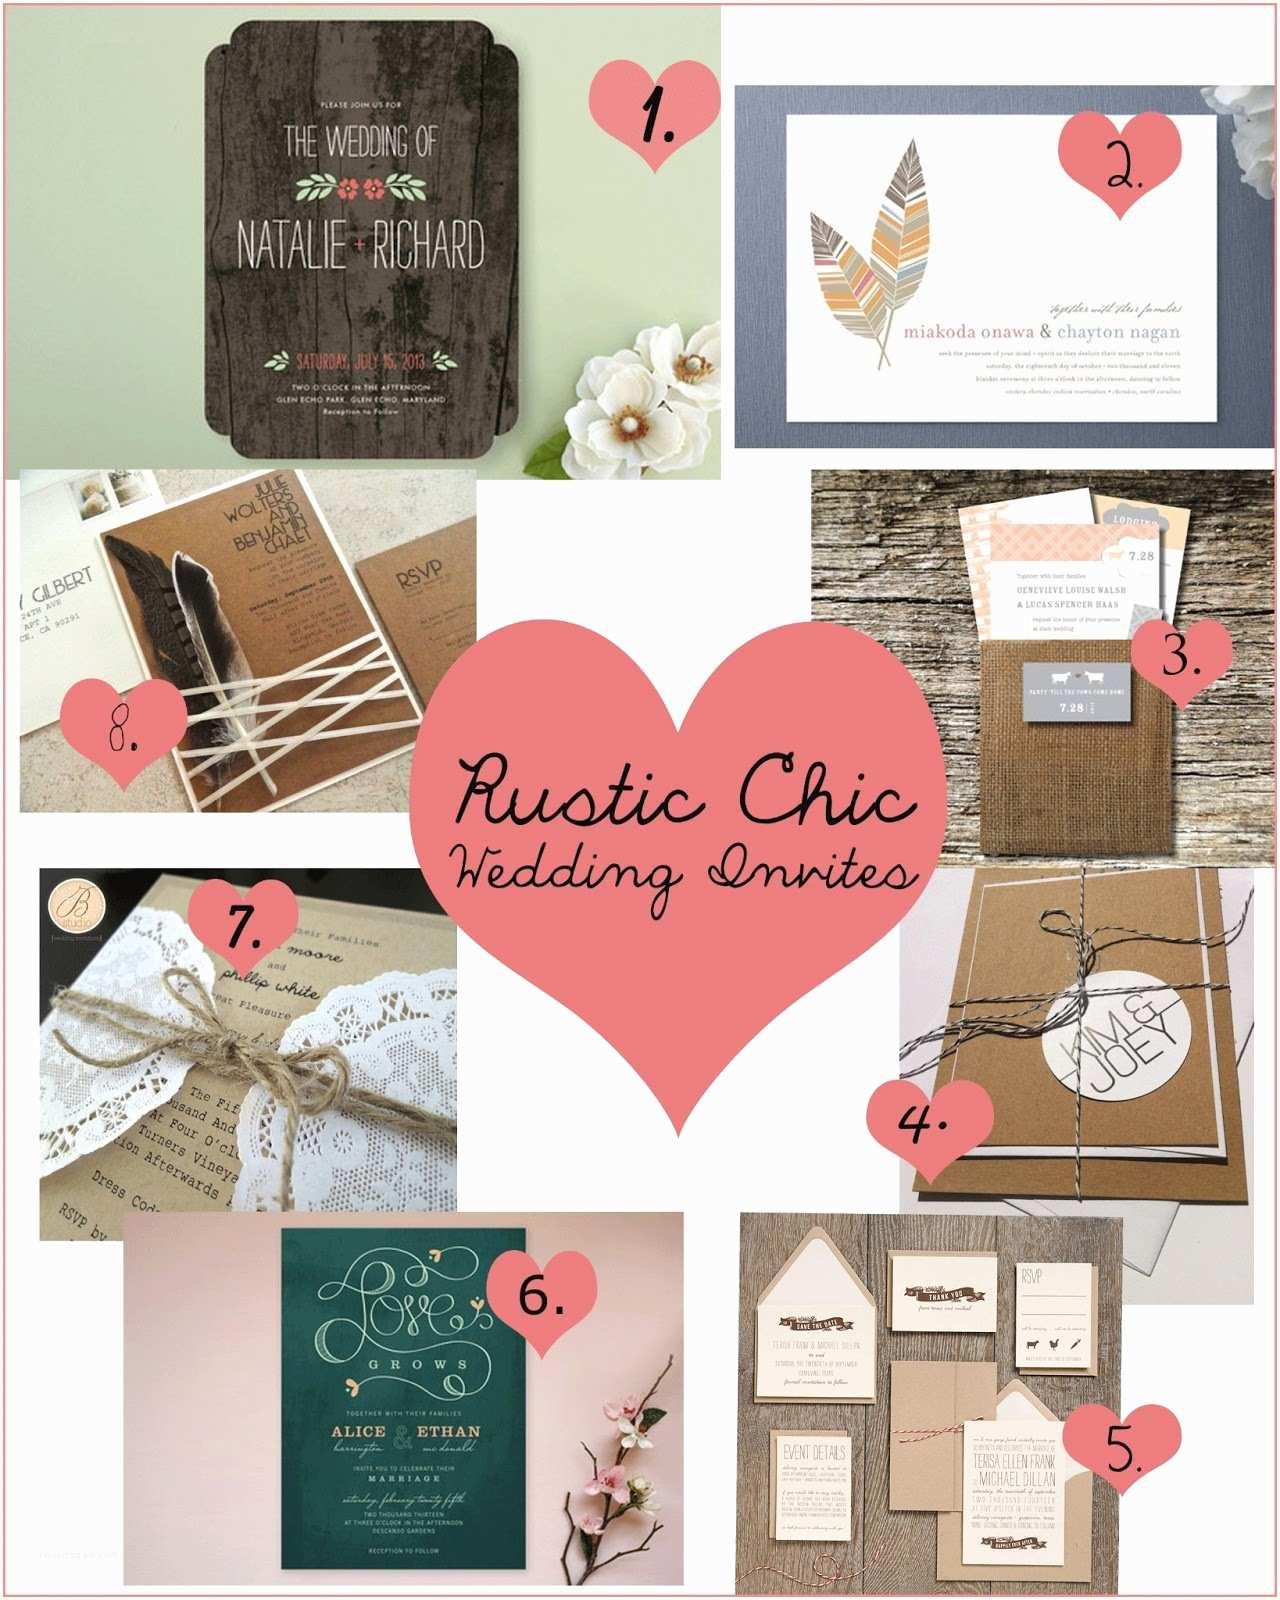 Rustic Chic Wedding Invitations ashley Thunder events Rustic Chic Wedding Invitation